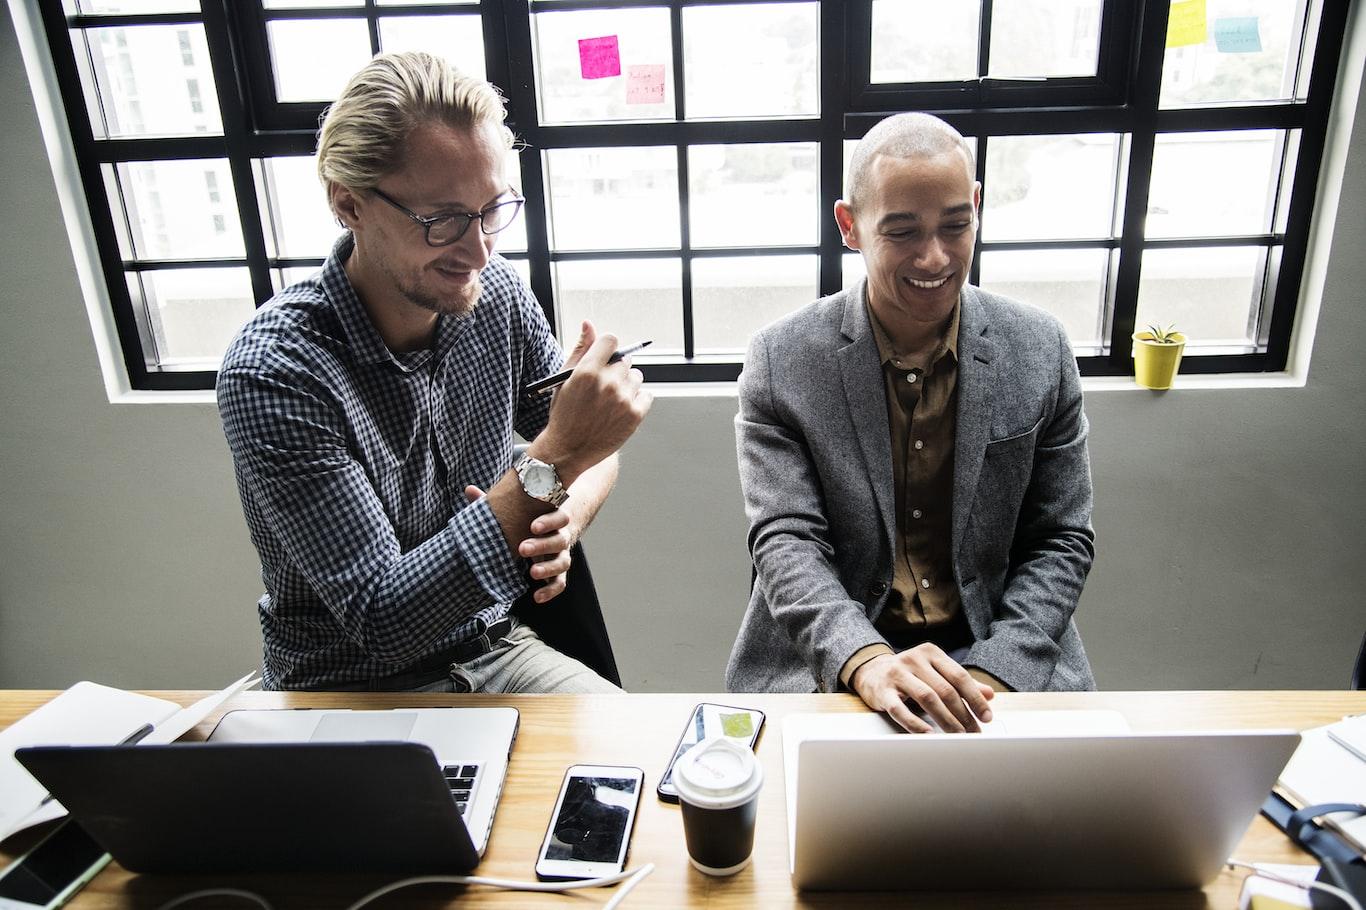 What iProspect's mentorship program taught me about informal leadership